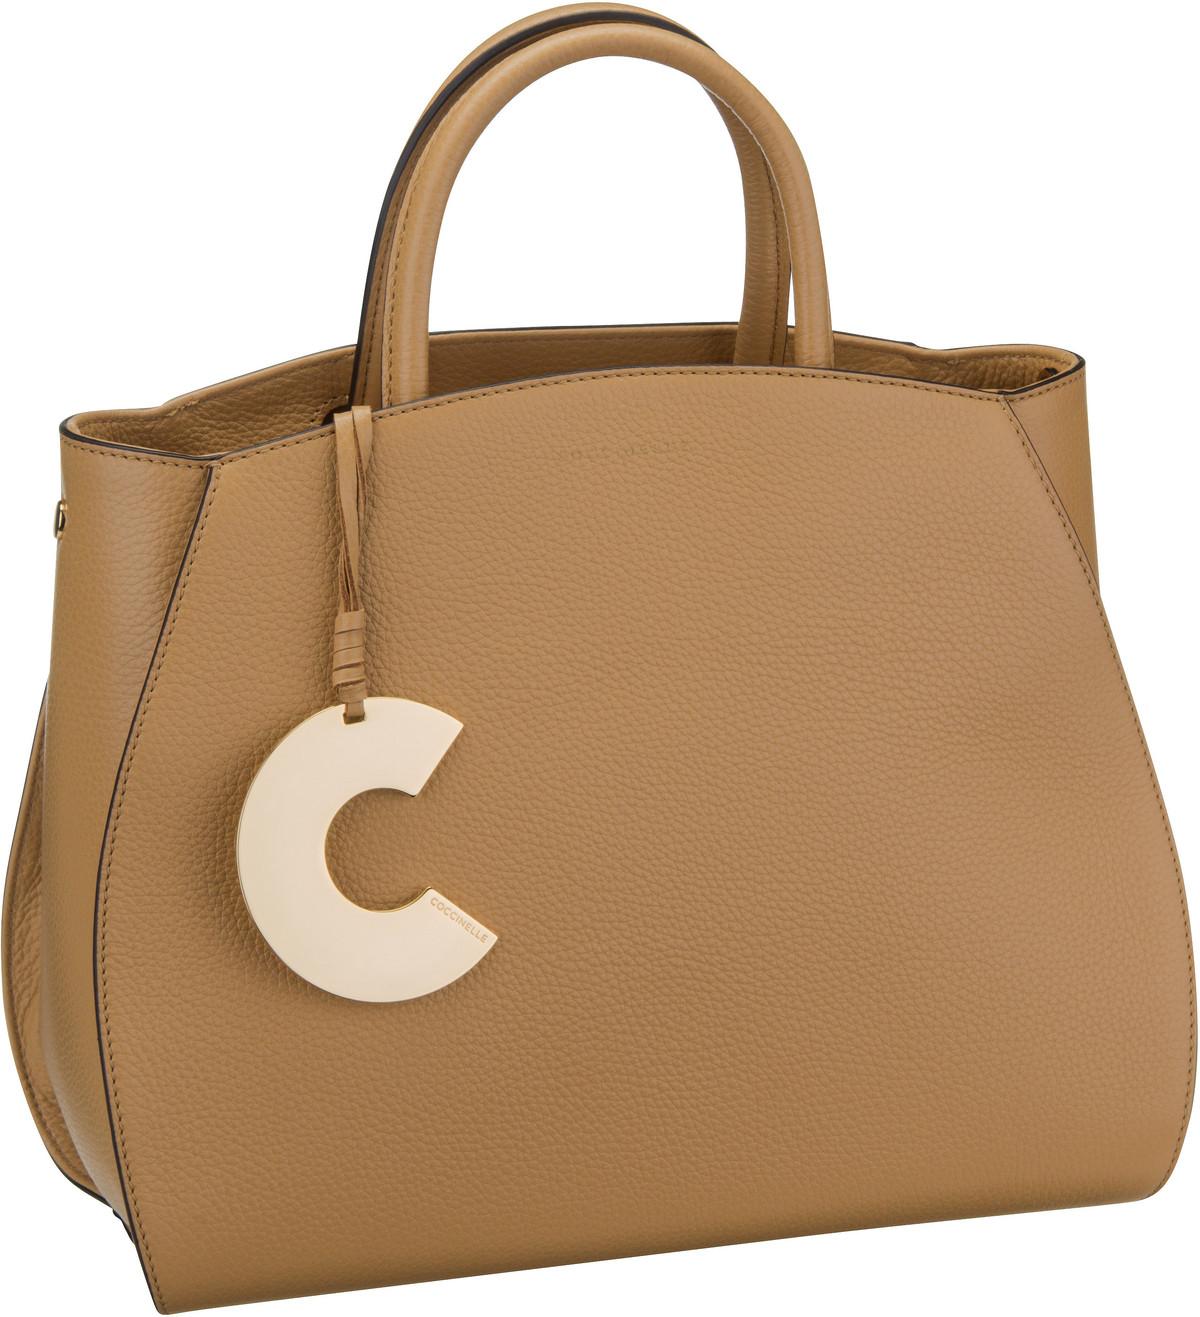 Handtasche Concrete 1801 Camel